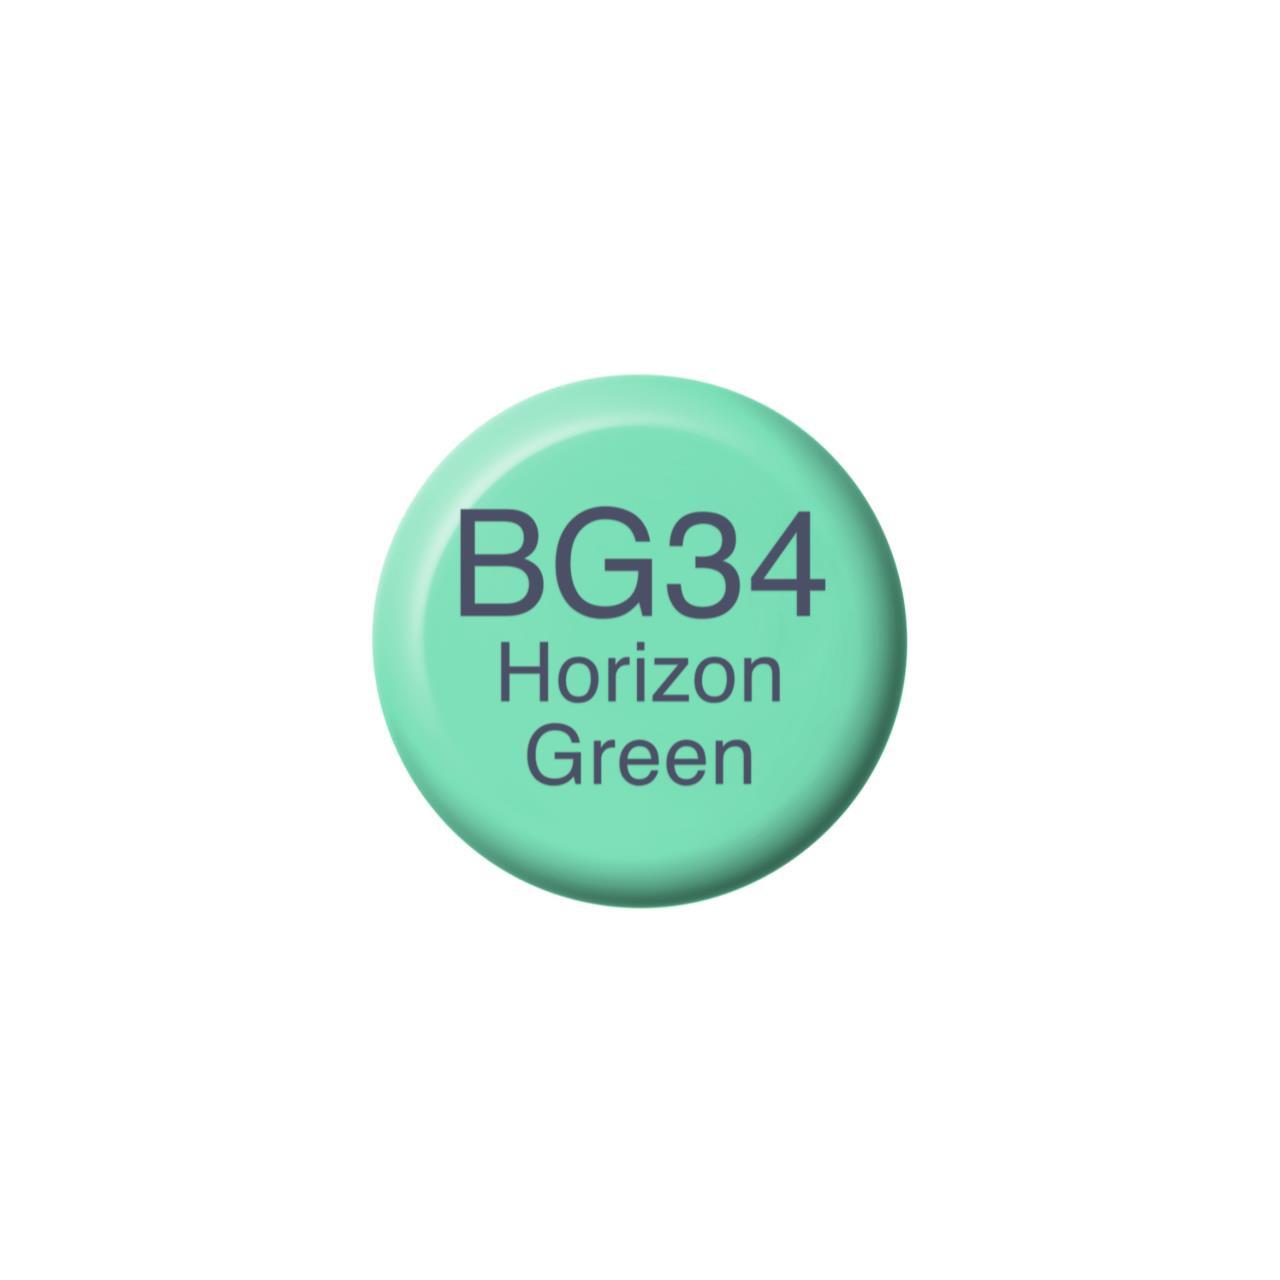 BG34 Horizon Green, Copic Ink - 4511338056295